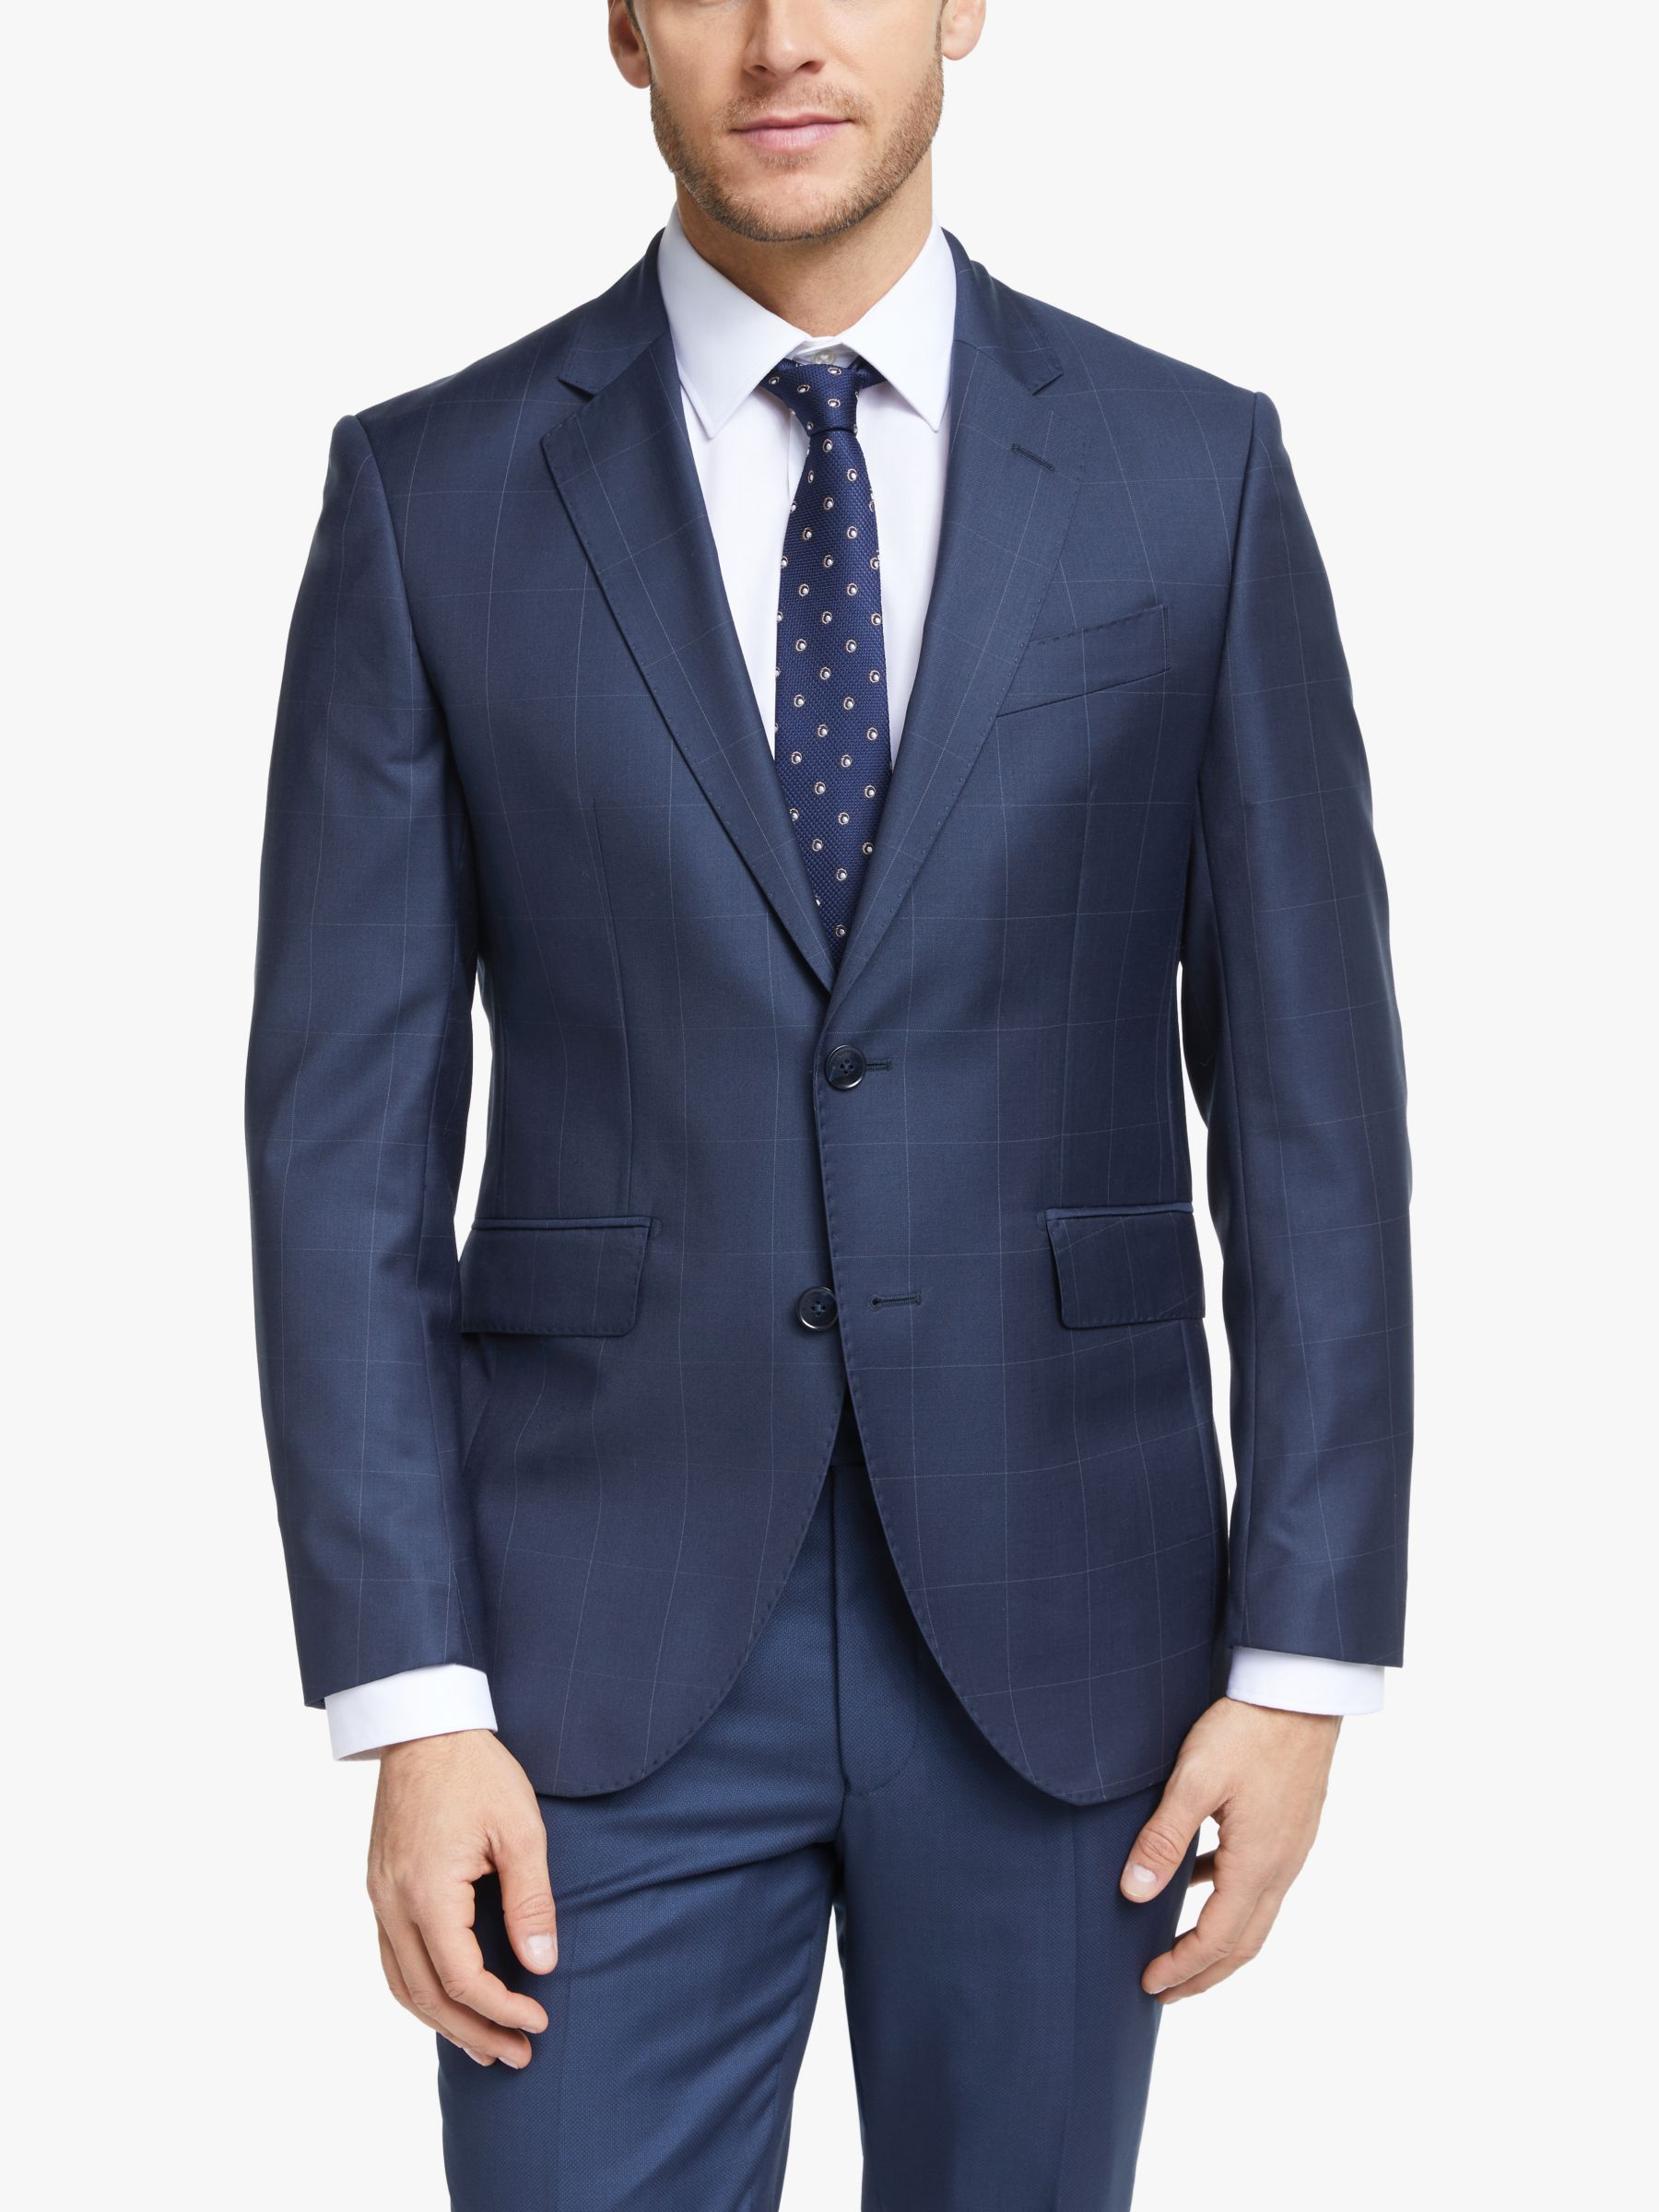 Hackett London Hackett London Windowpane Check Slim Fit Suit Jacket, Navy